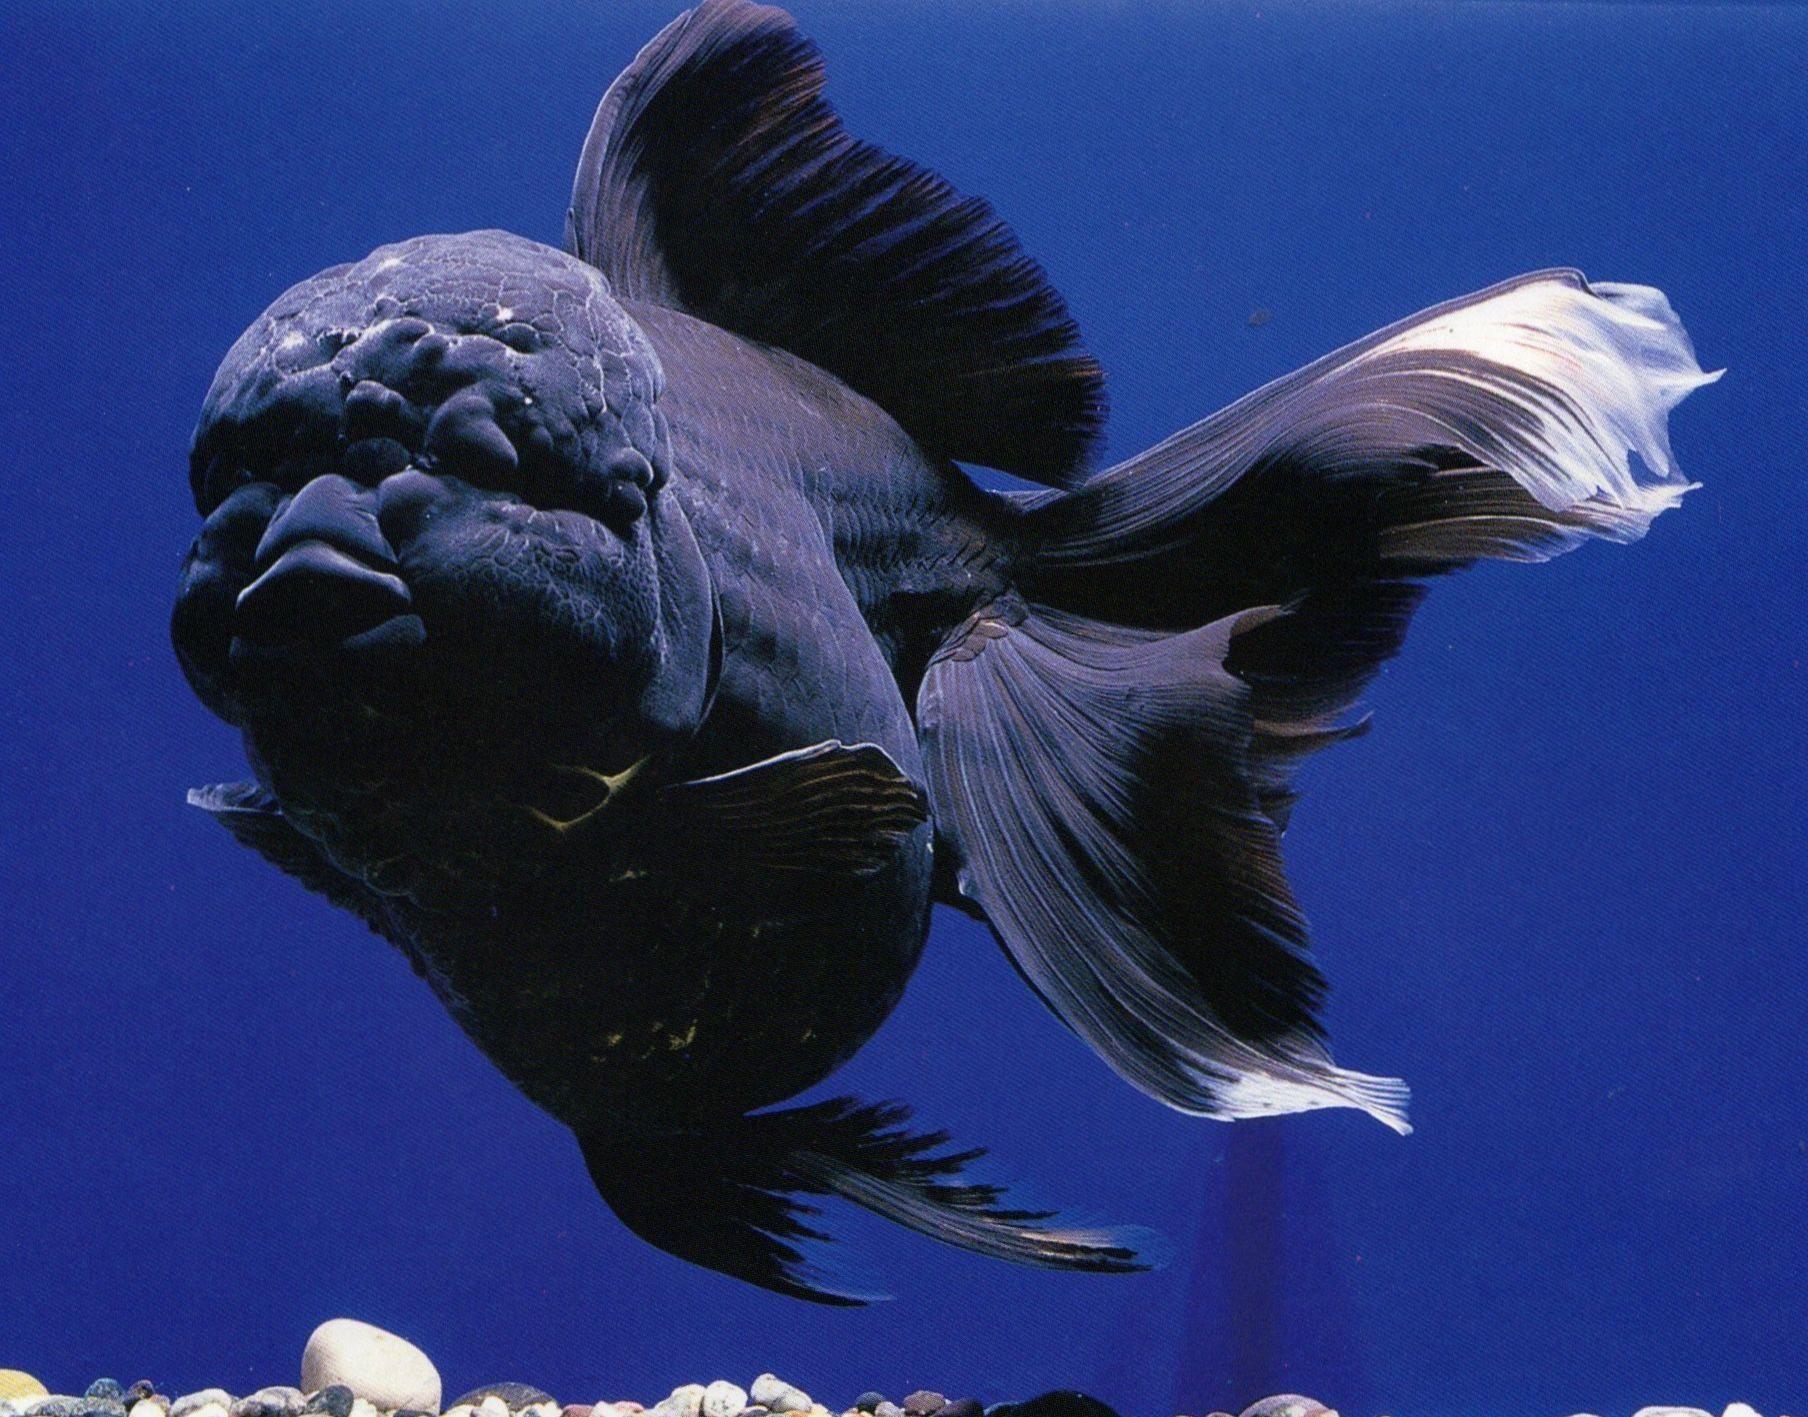 A Black Oranda Goldfish Had A Vaguely Human Like Head Also Looks Like A Blackberry Oranda Goldfish Goldfish Goldfish Aquarium